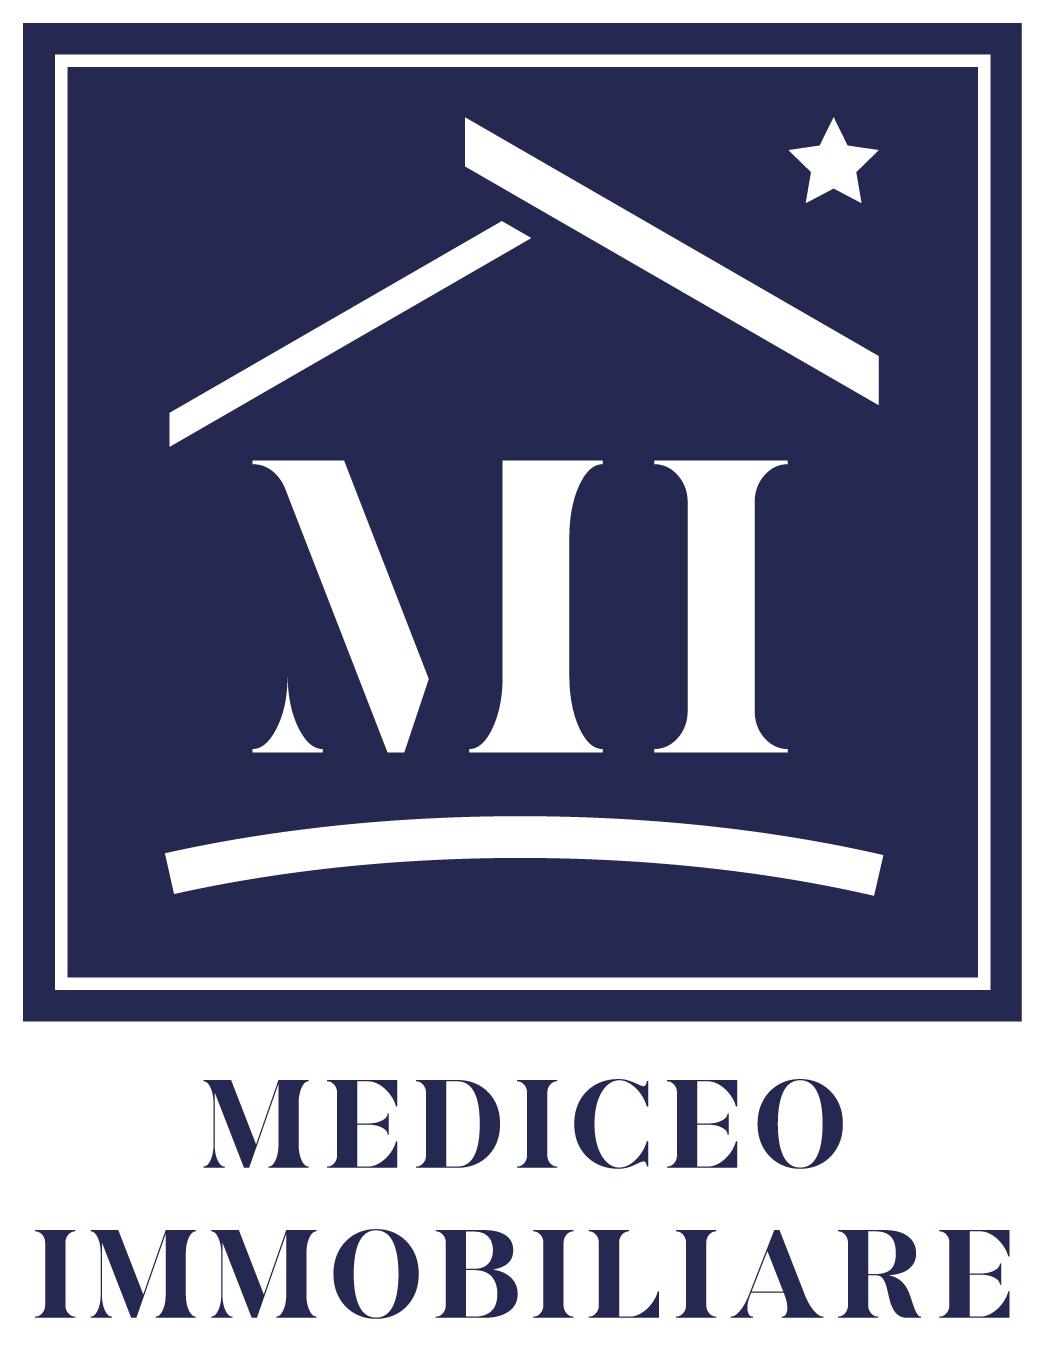 logo TOSCANA Immobiliare Pisa Lungarno Mediceo